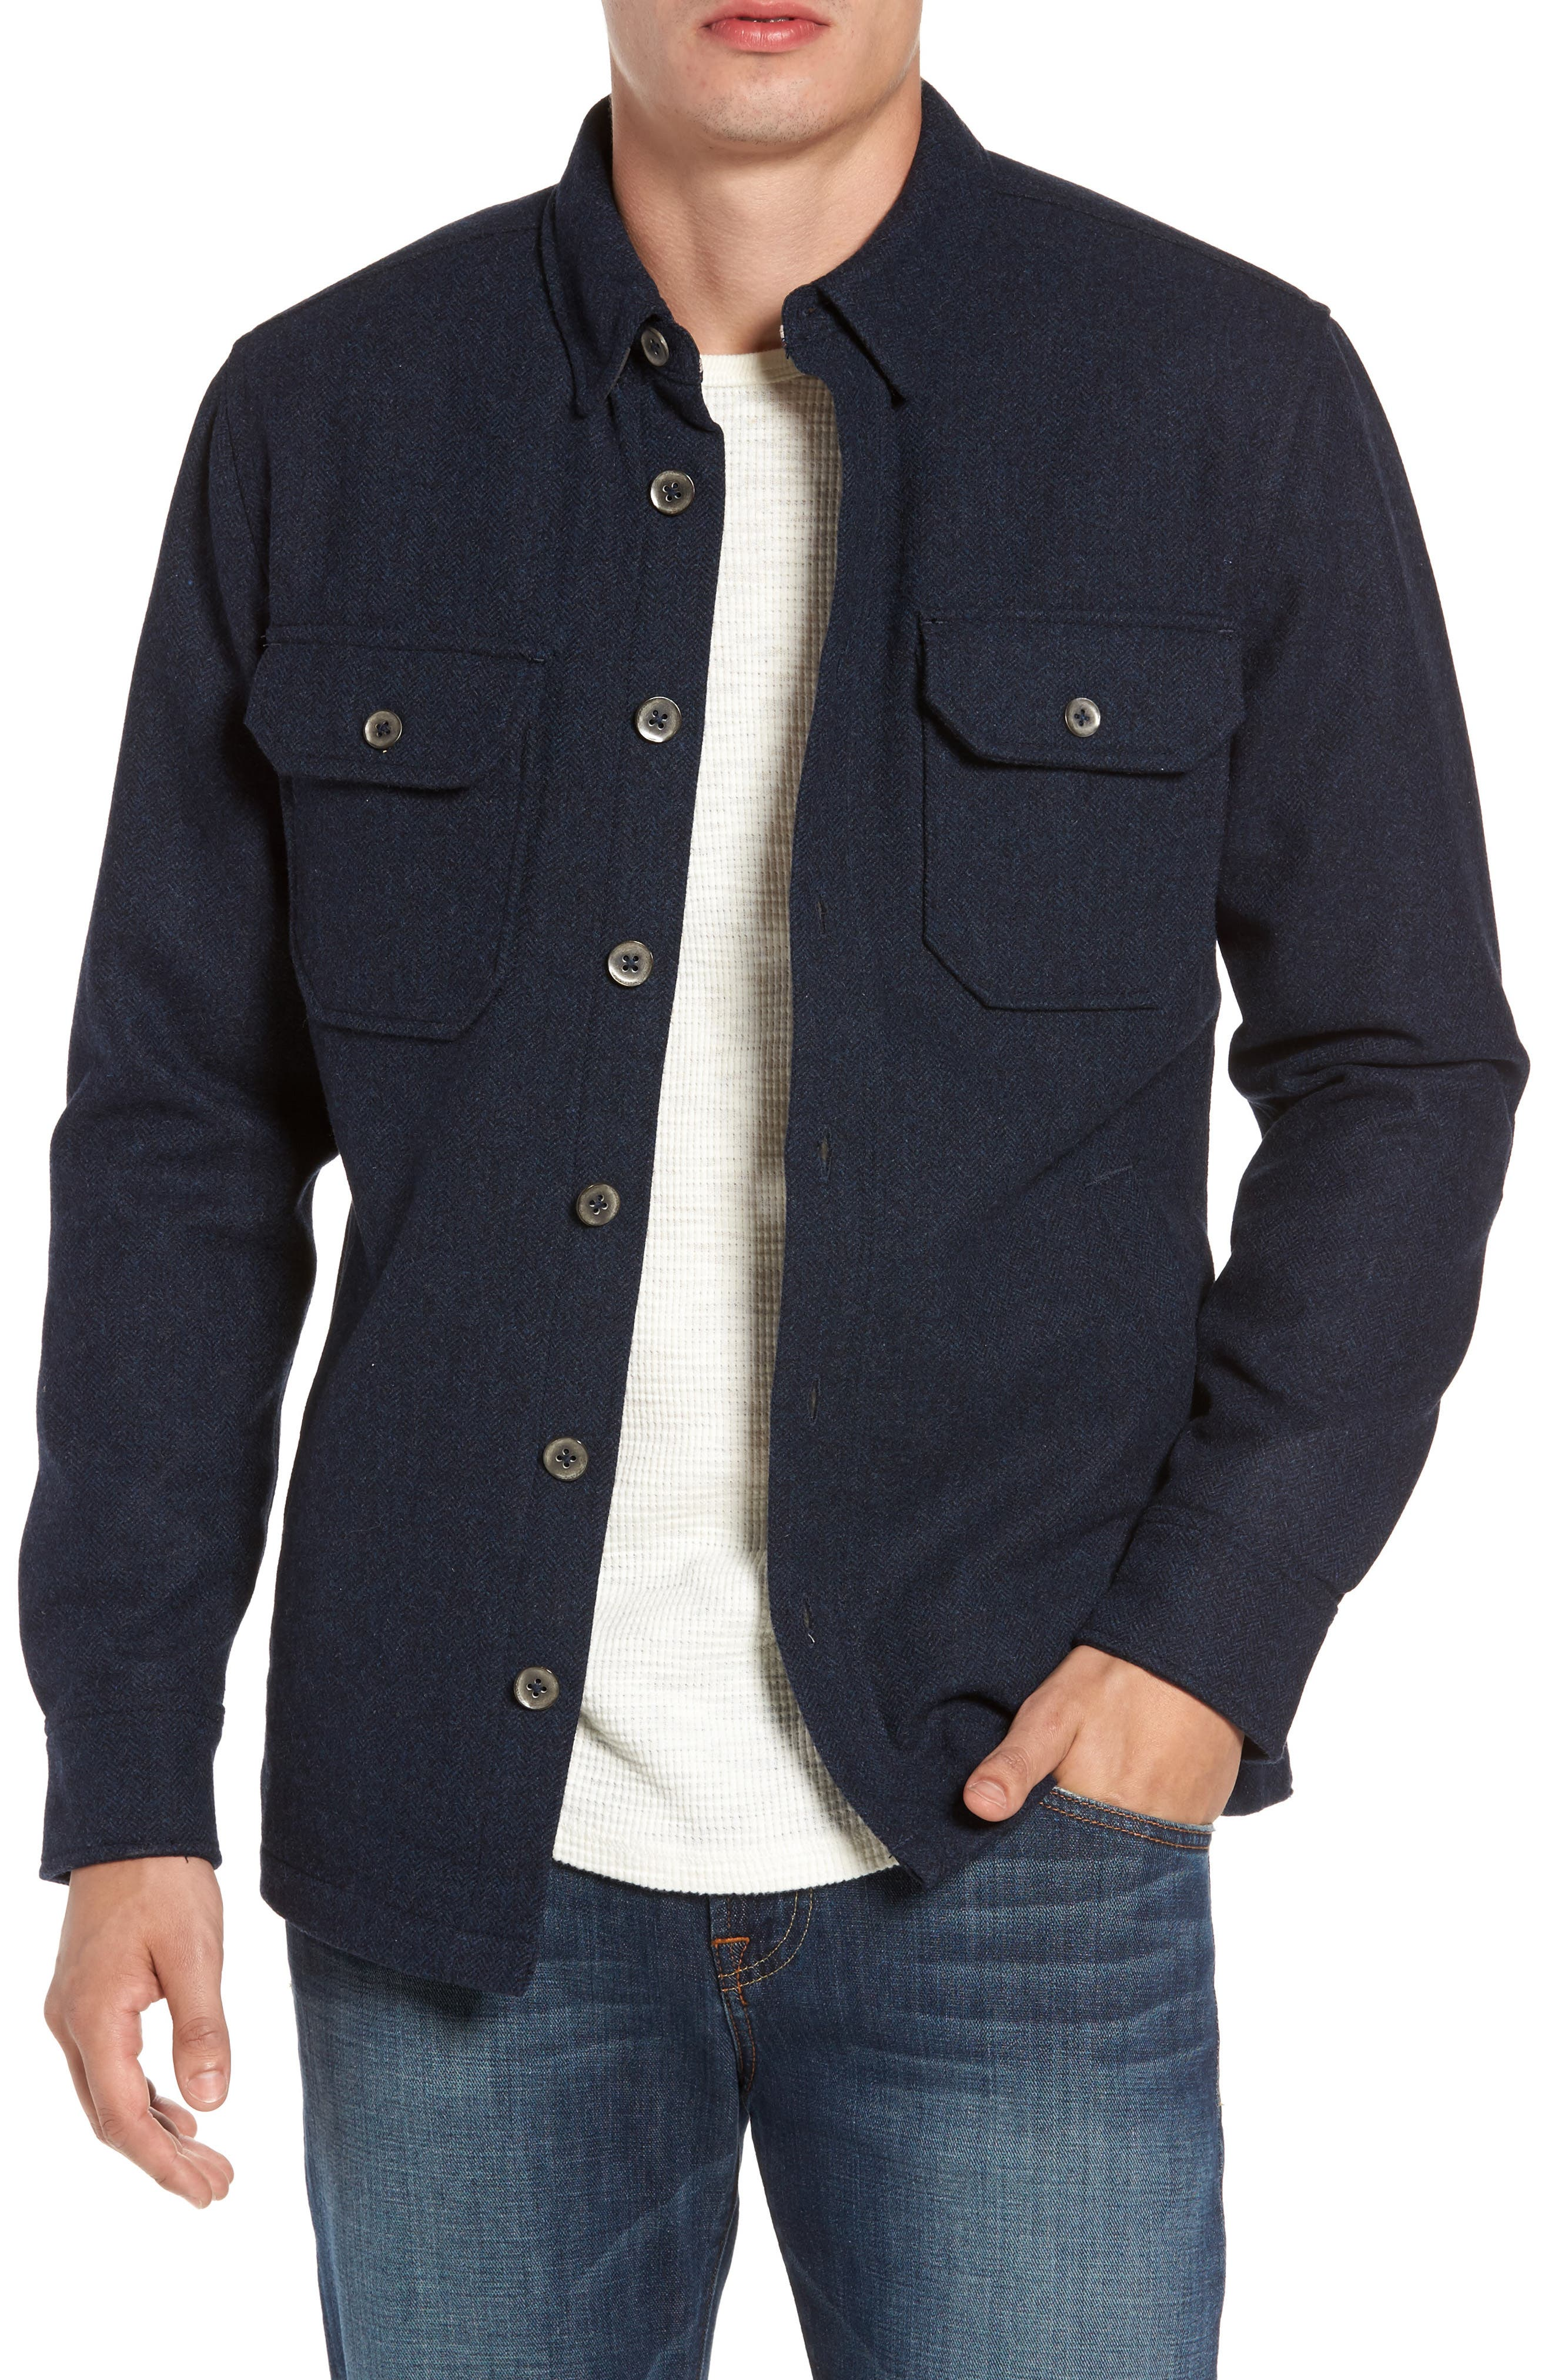 Creek Herringbone Wool Shirt Jacket,                             Main thumbnail 1, color,